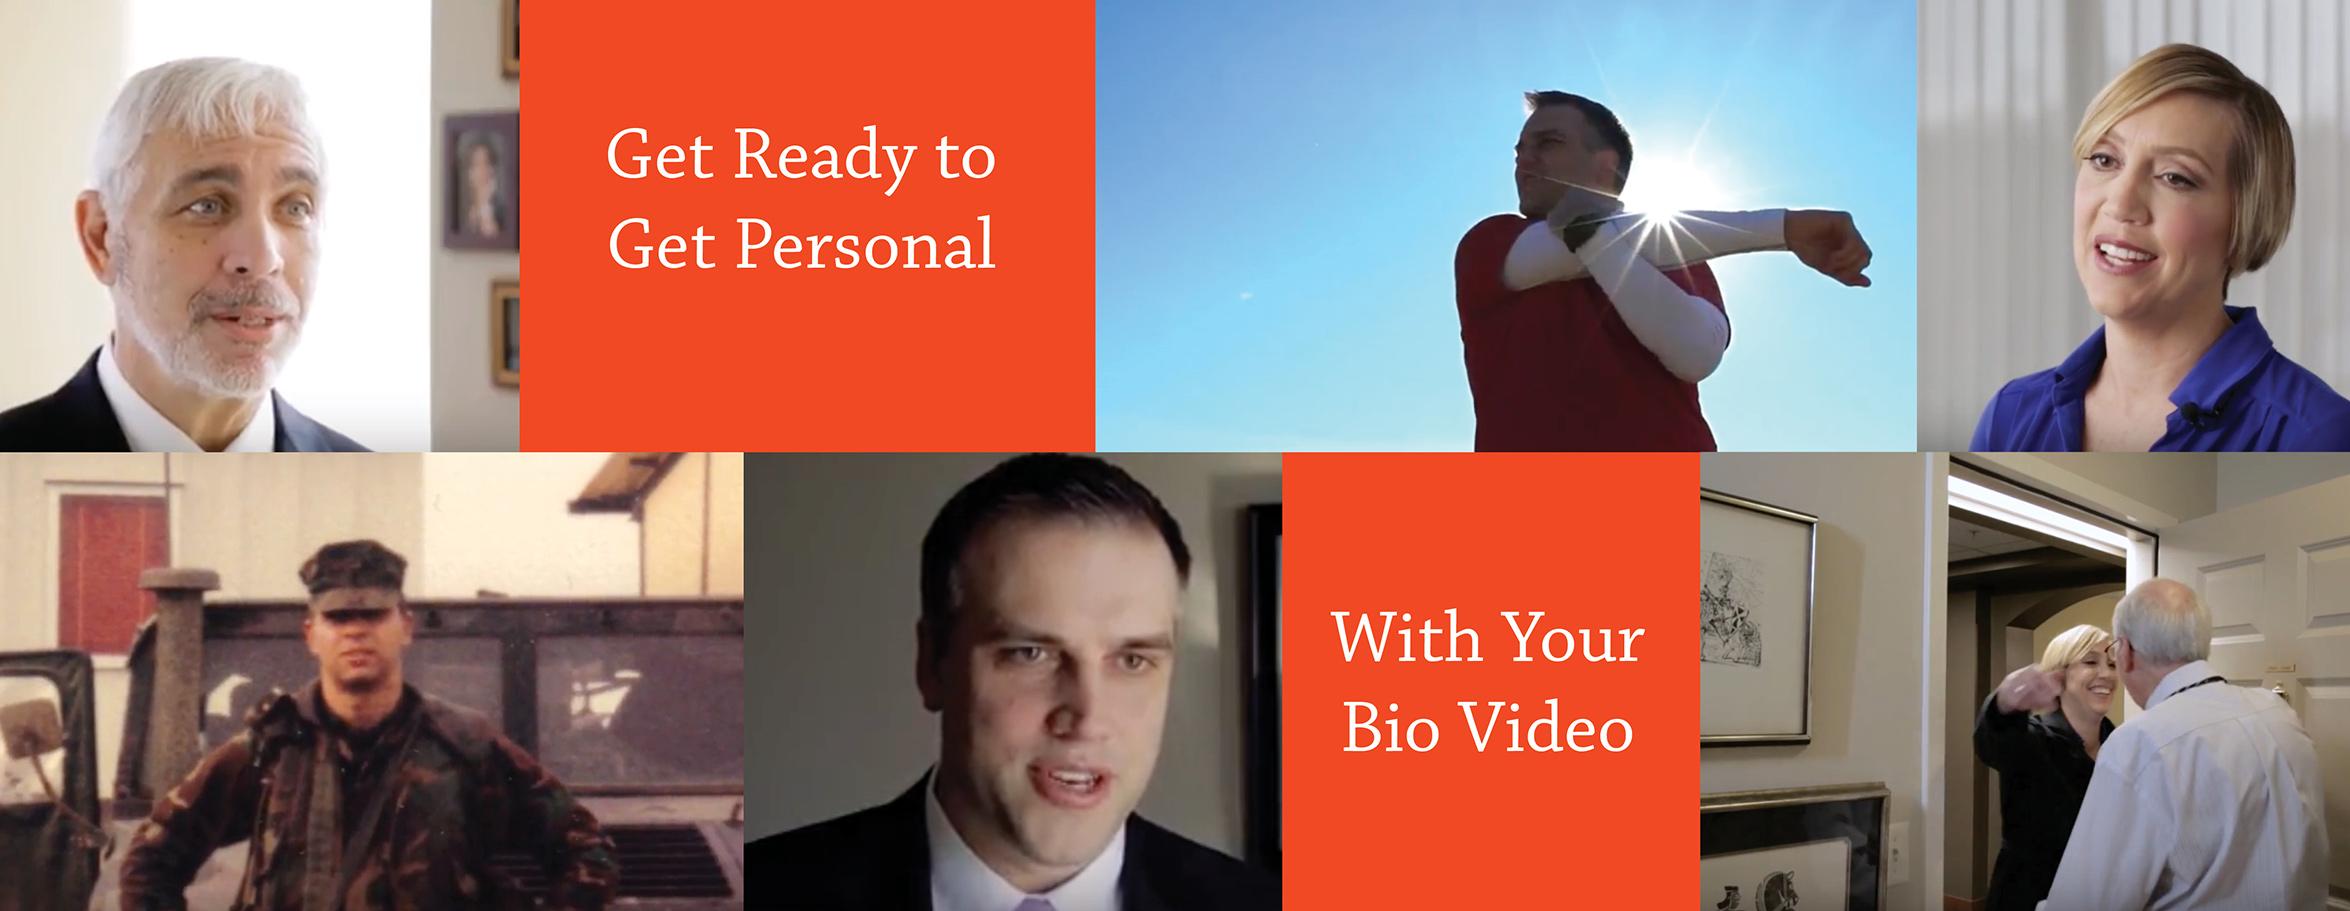 bio-video.jpg